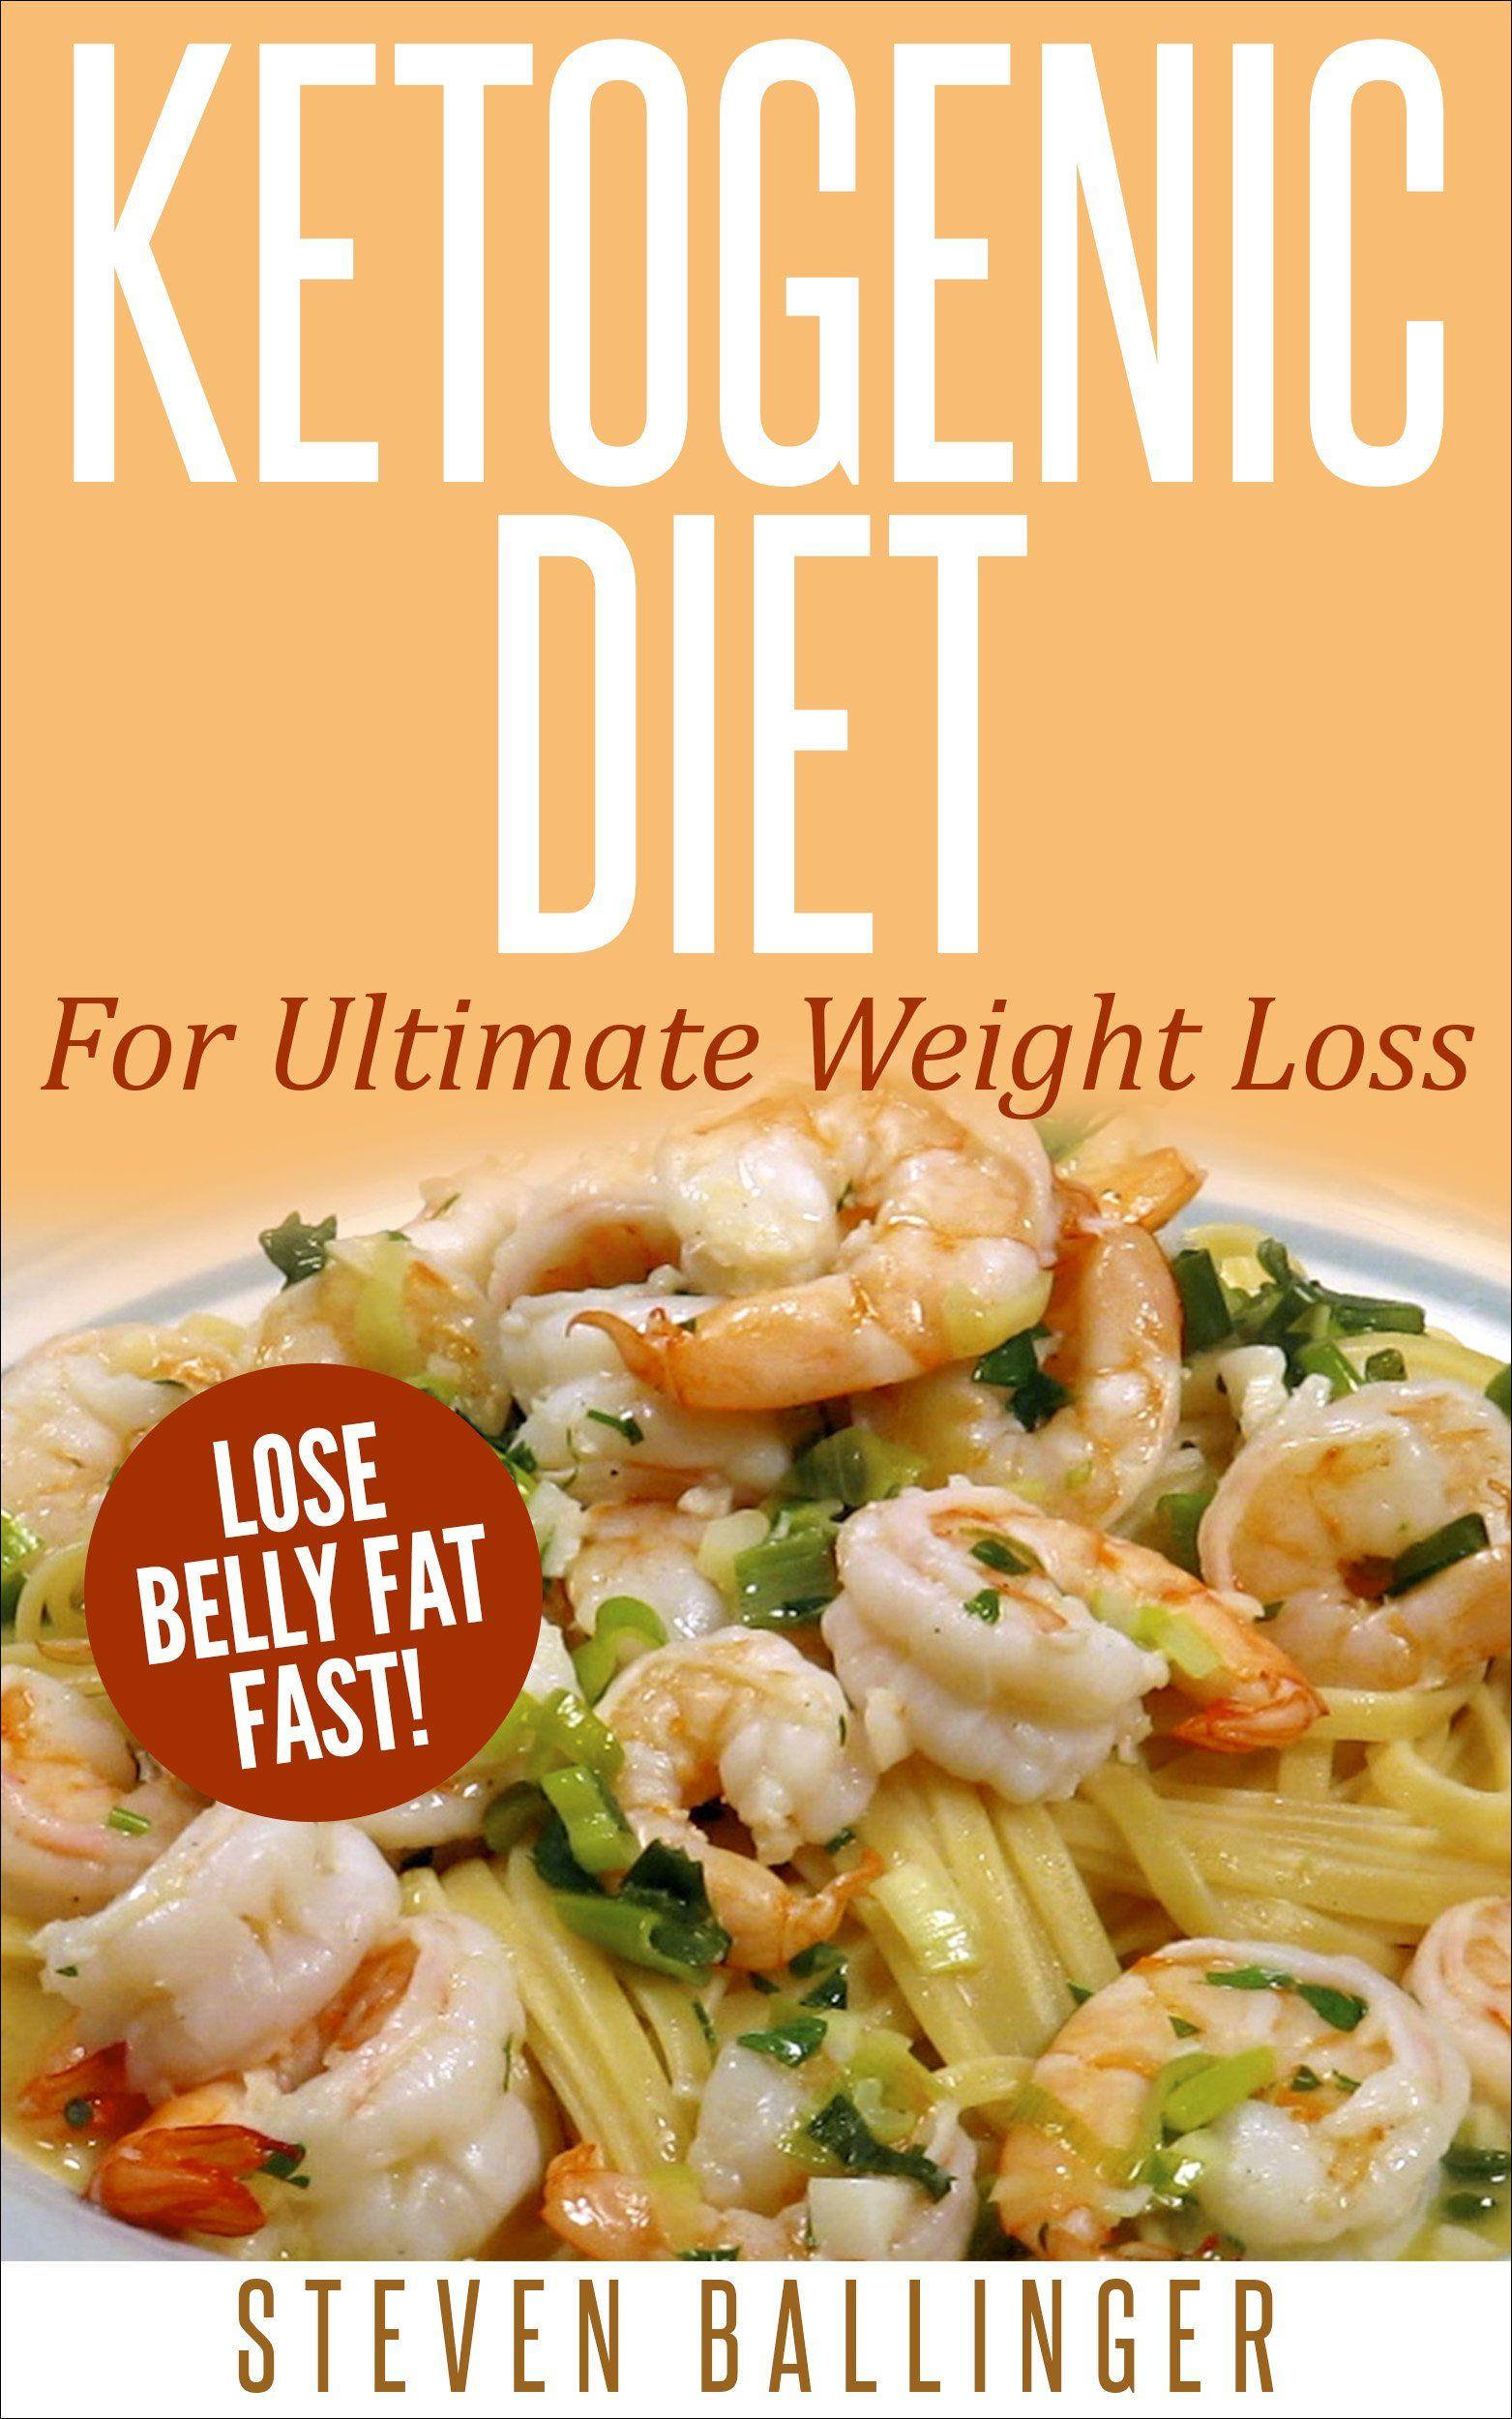 World best diet plan for weight loss photo 2